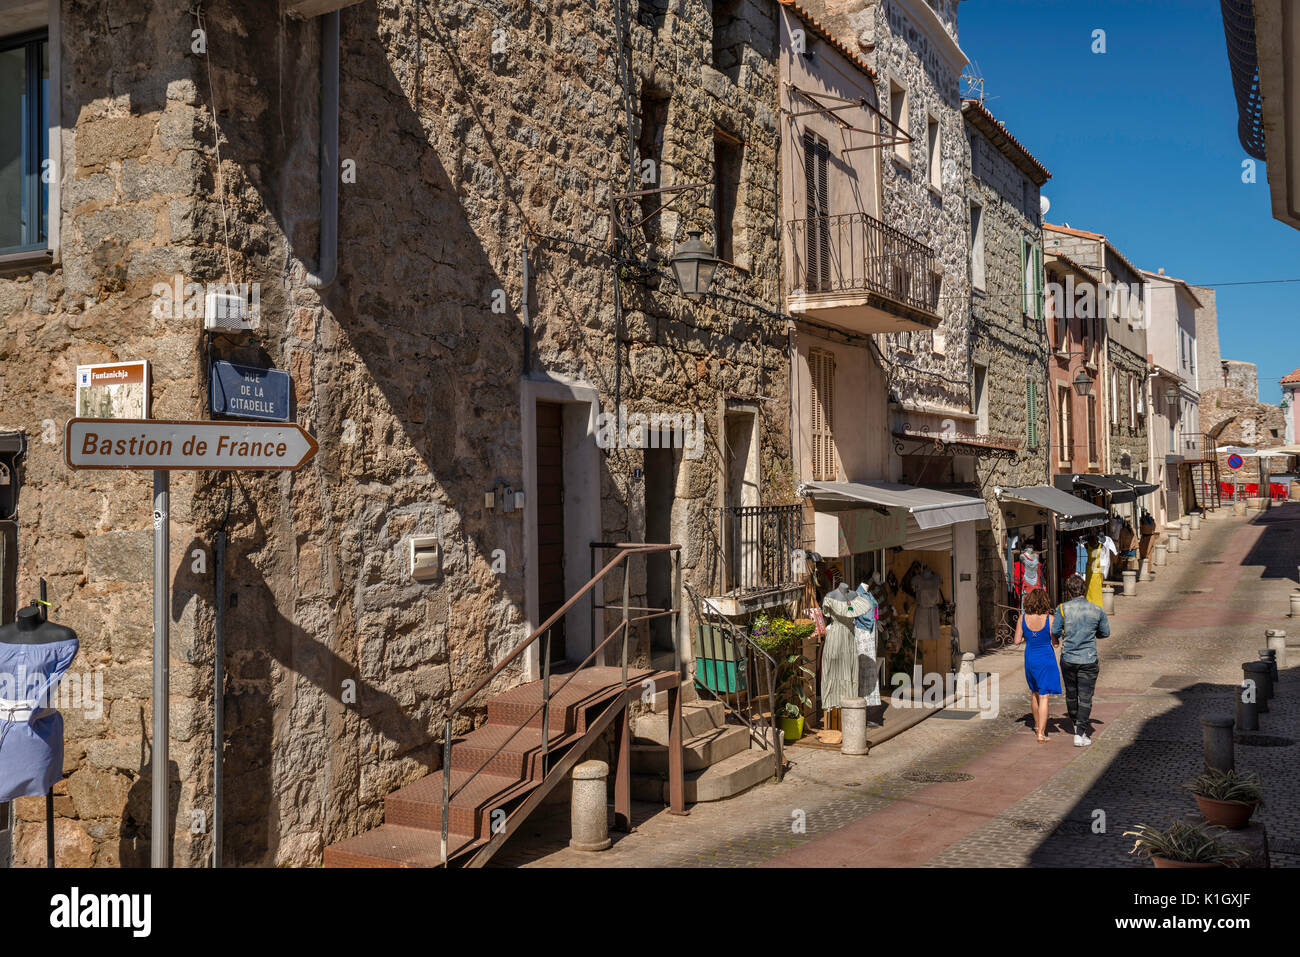 Rue de la Citadelle, Altstadt hilltop Abschnitt von Porto-Vecchio, Korsika, Frankreich Stockbild